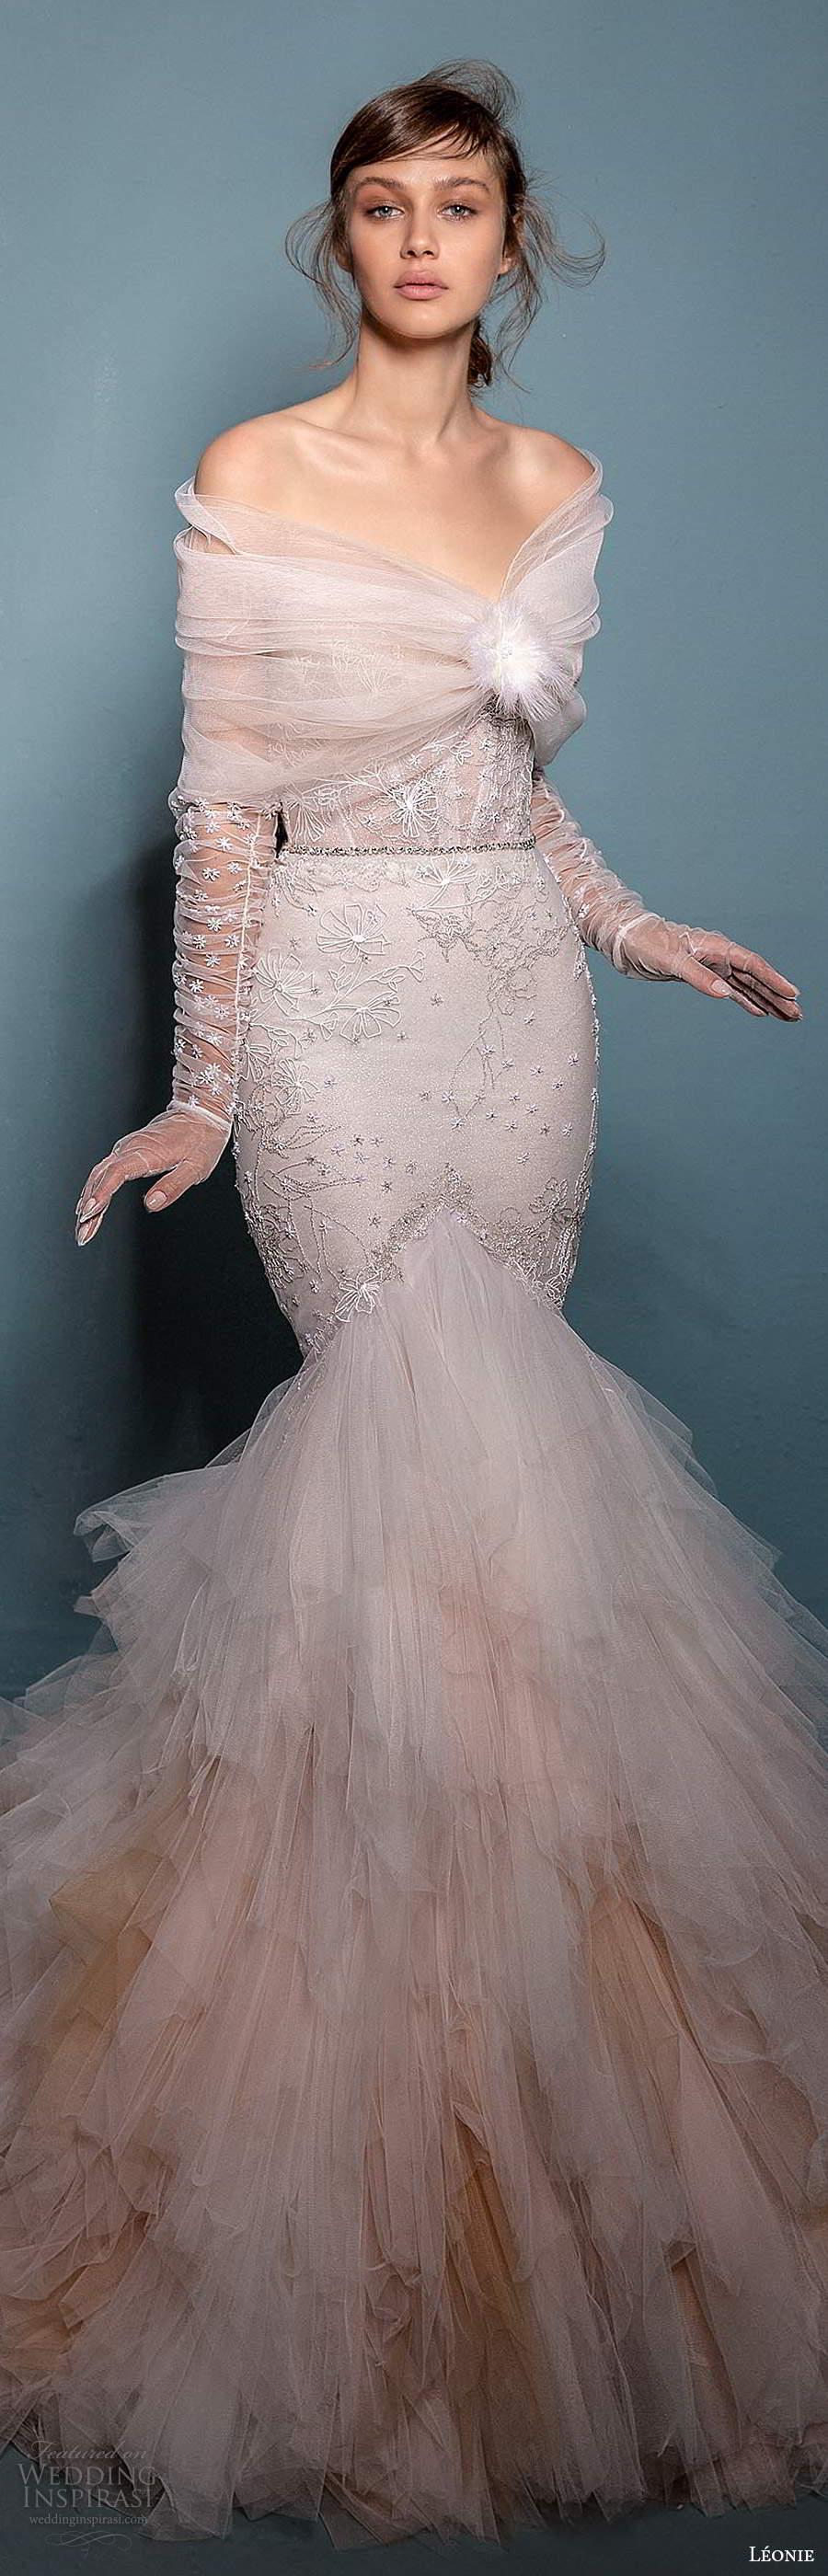 leonie bridal 2020 bridal strapless sweetheart neckline embellished fit flare mermaid wedding dress chapel train offshoulder shawl capelet (3) lv